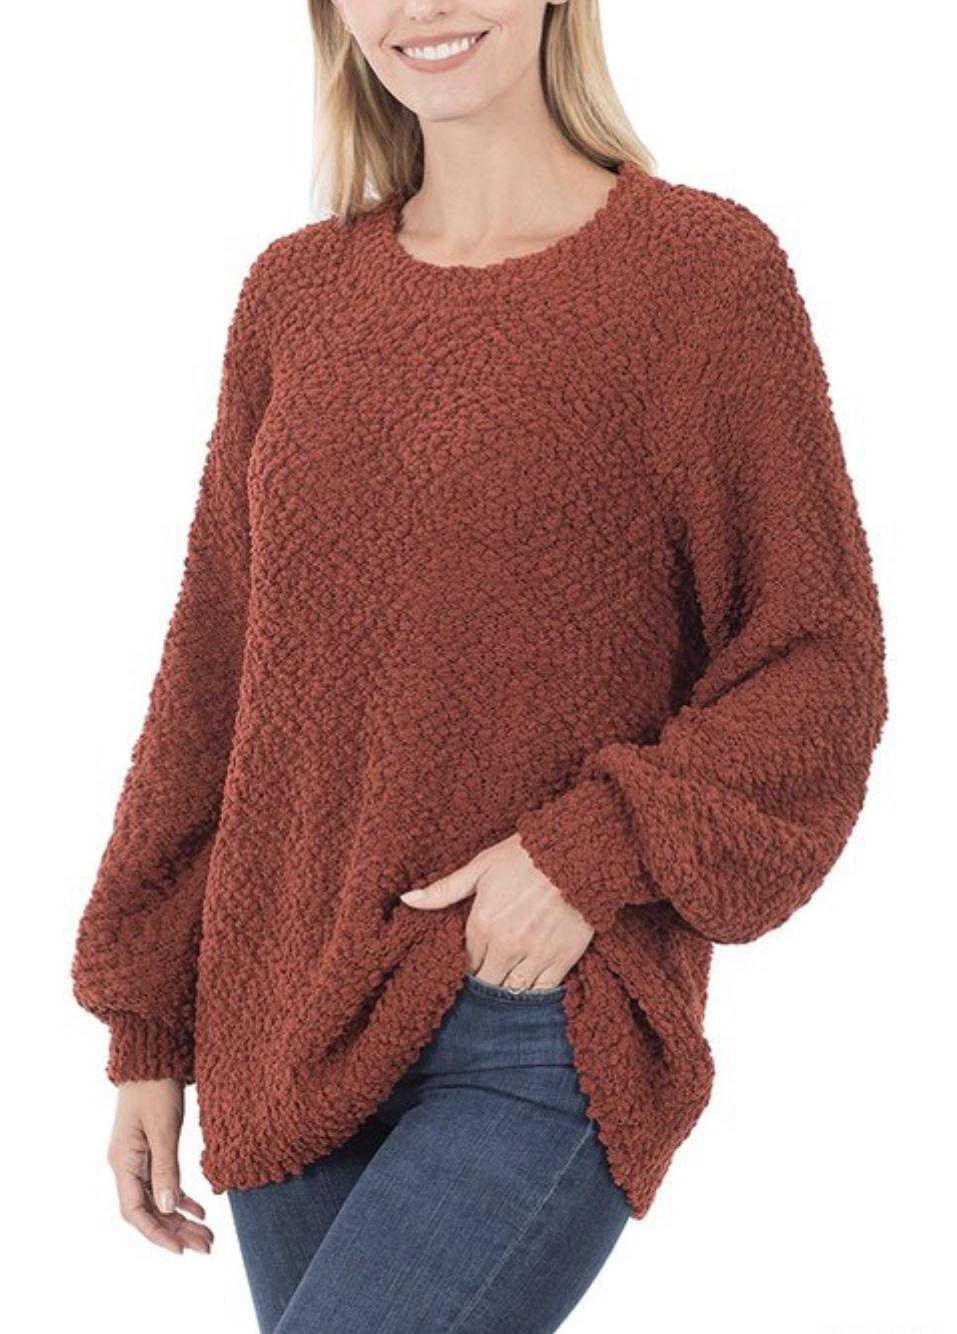 Rust Popcorn Pullover Sweater